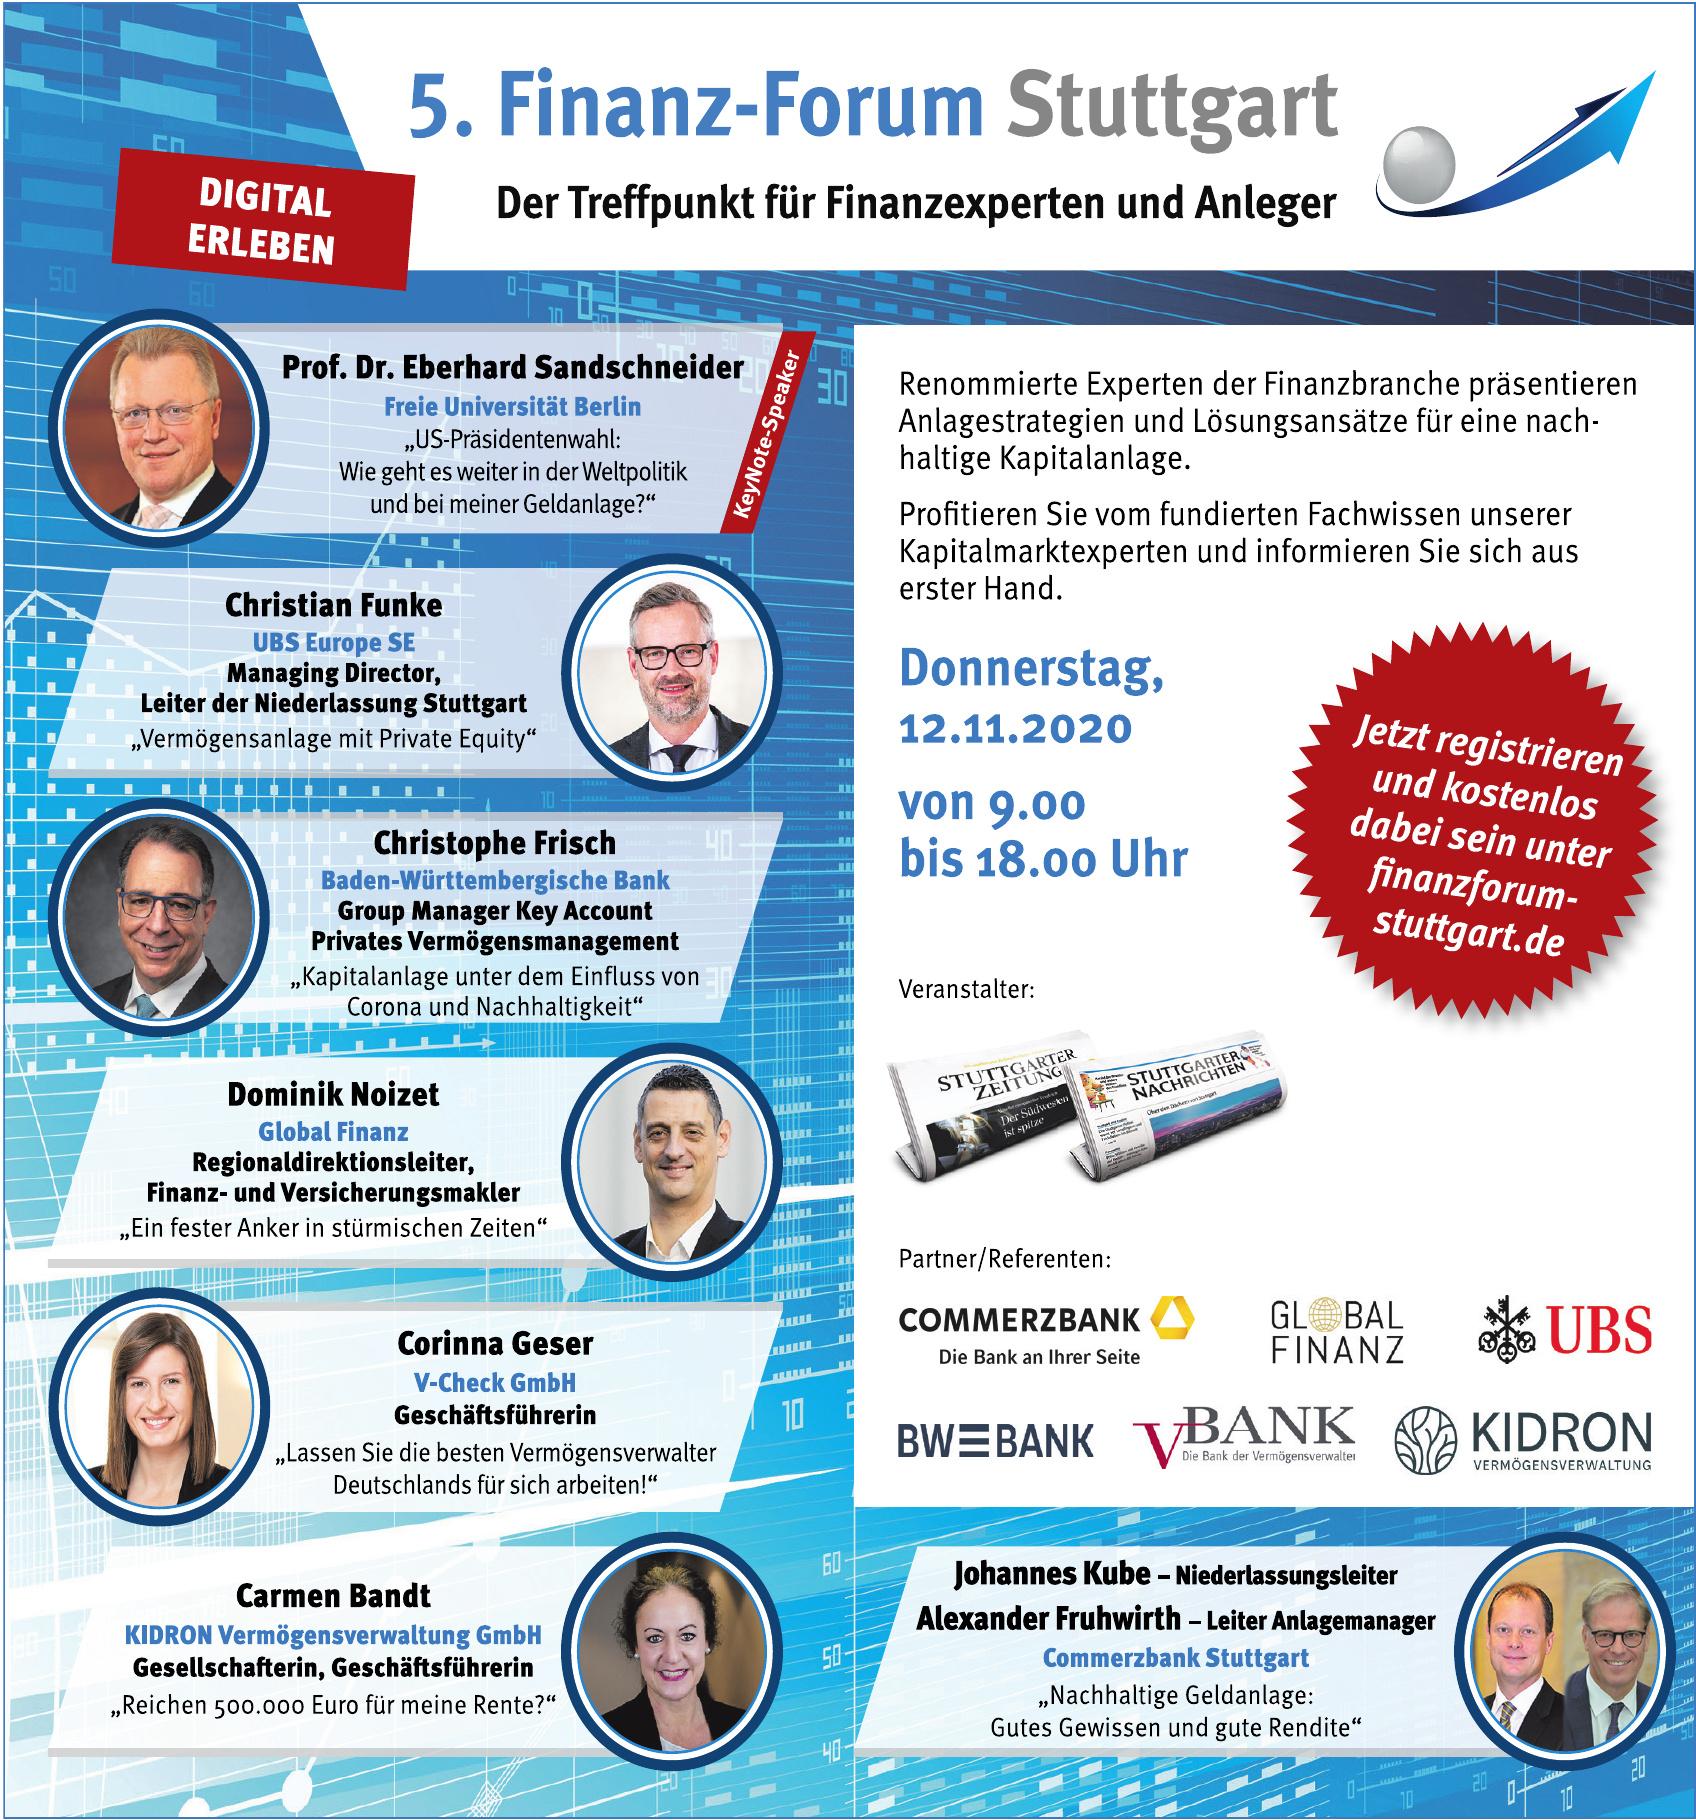 5. Finanz-Forum Stuttgart